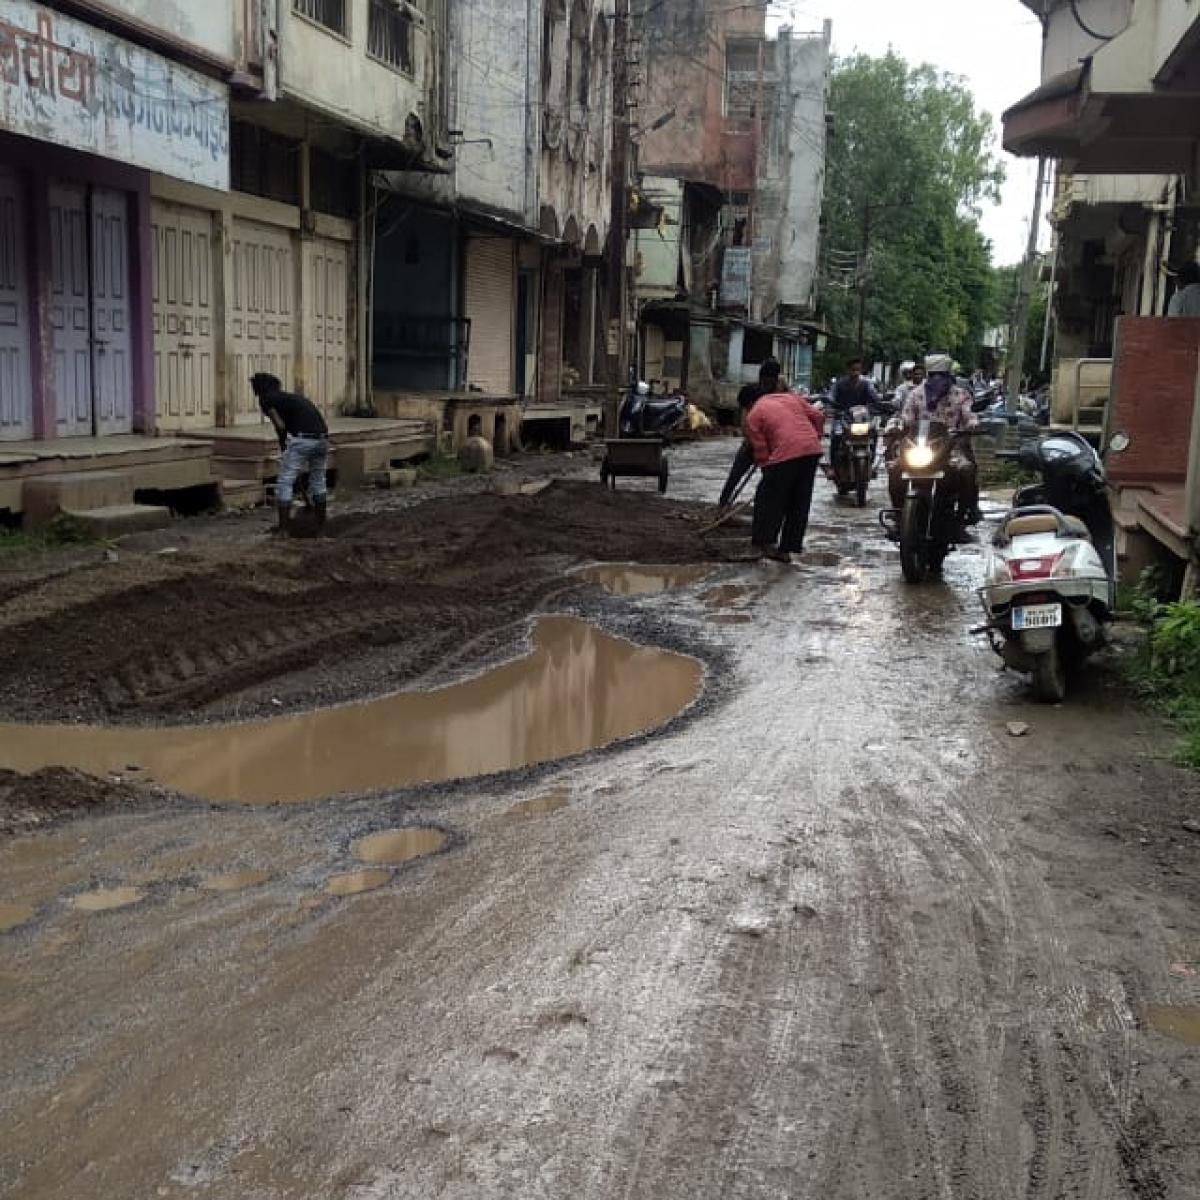 Free Press Impact: At last, Khetia municipality wakes up to refurbishment of MG Road